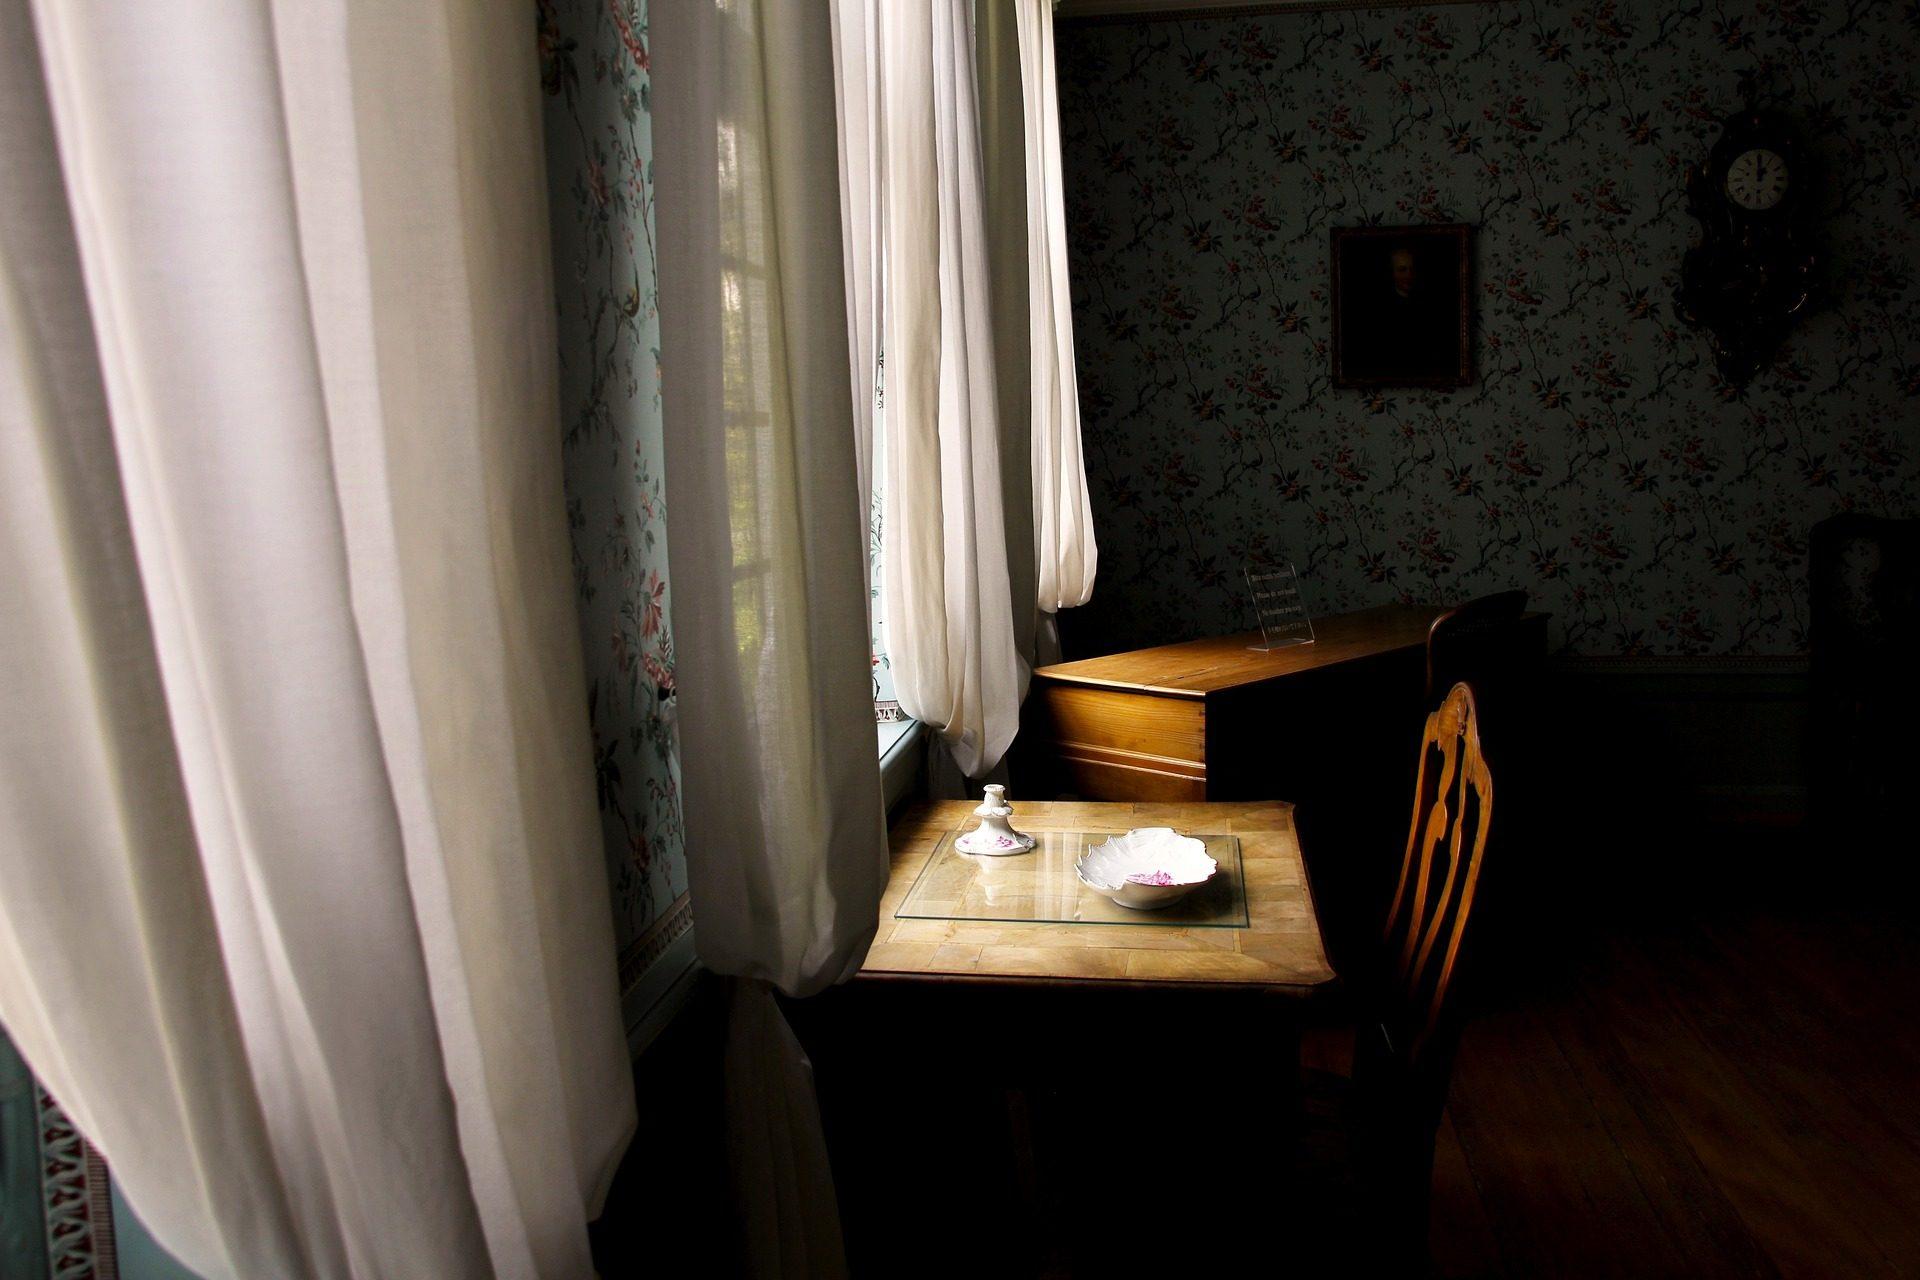 Tabelle, Schreibtisch, Stuhl, Fenster, Vorhänge, Tablett - Wallpaper HD - Prof.-falken.com